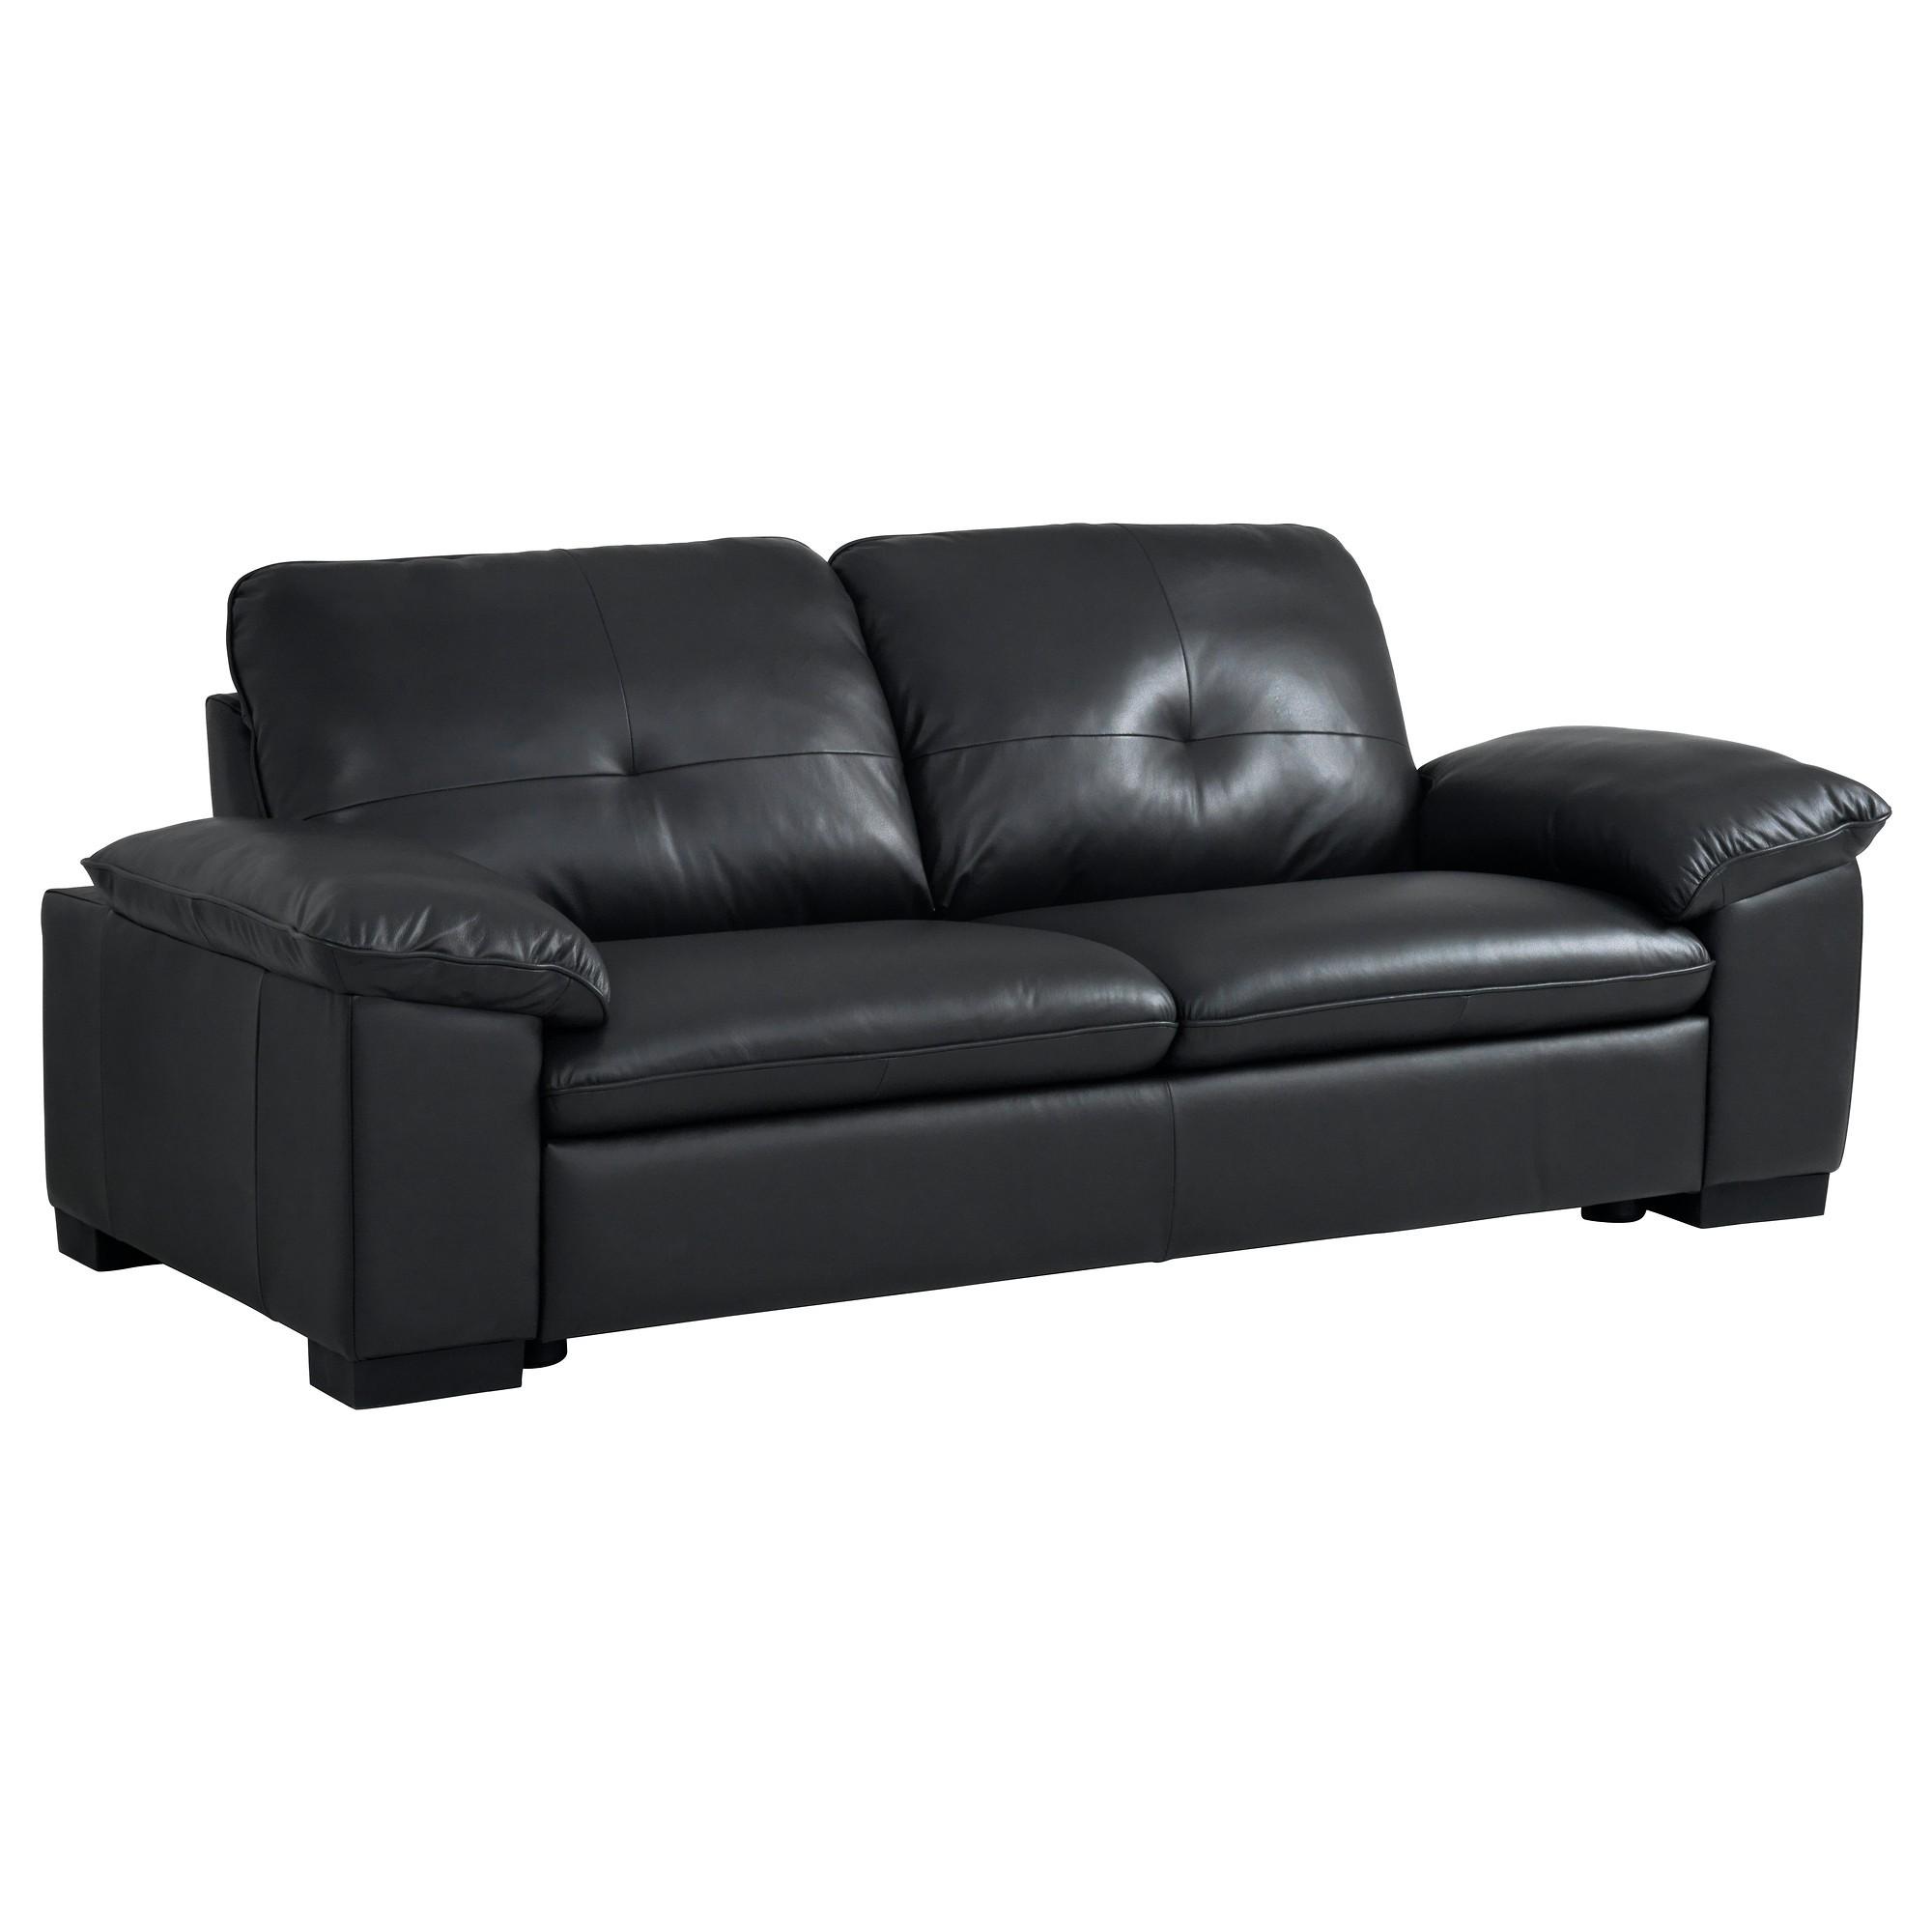 Ikea Canapé D'angle Convertible En Lit